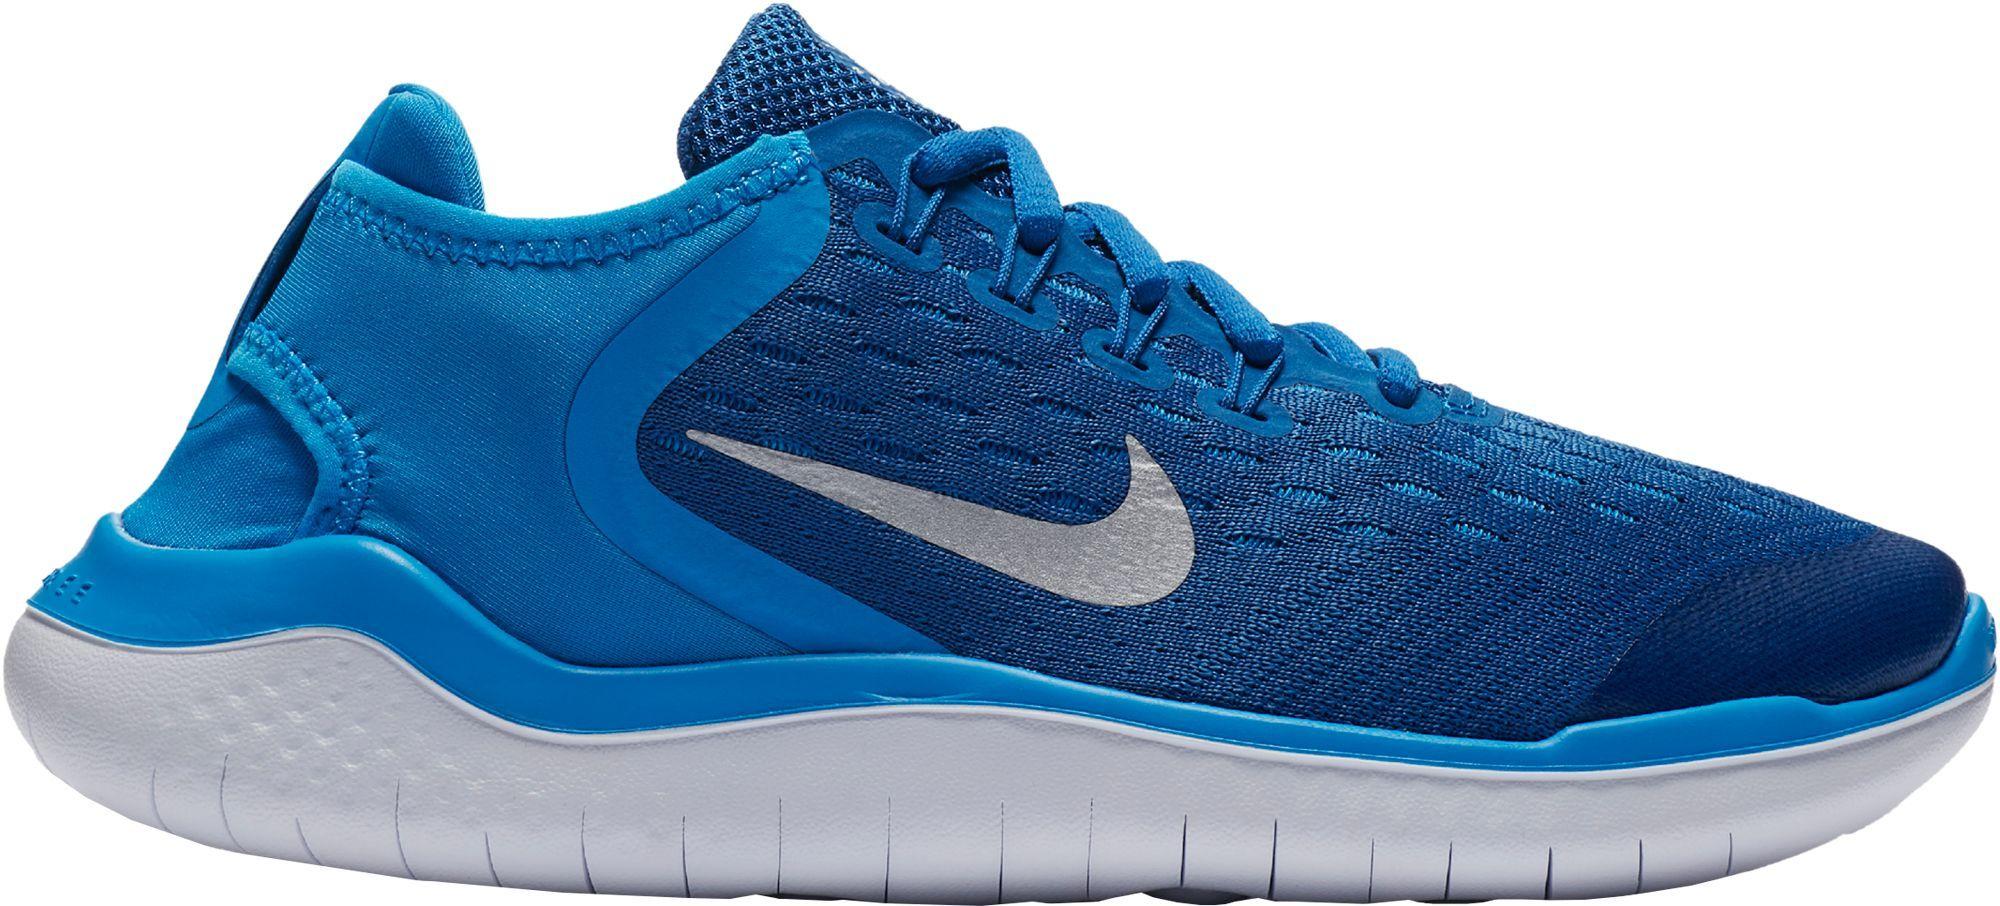 Nike Kids' Grade School Free RN 2018 Running Shoes